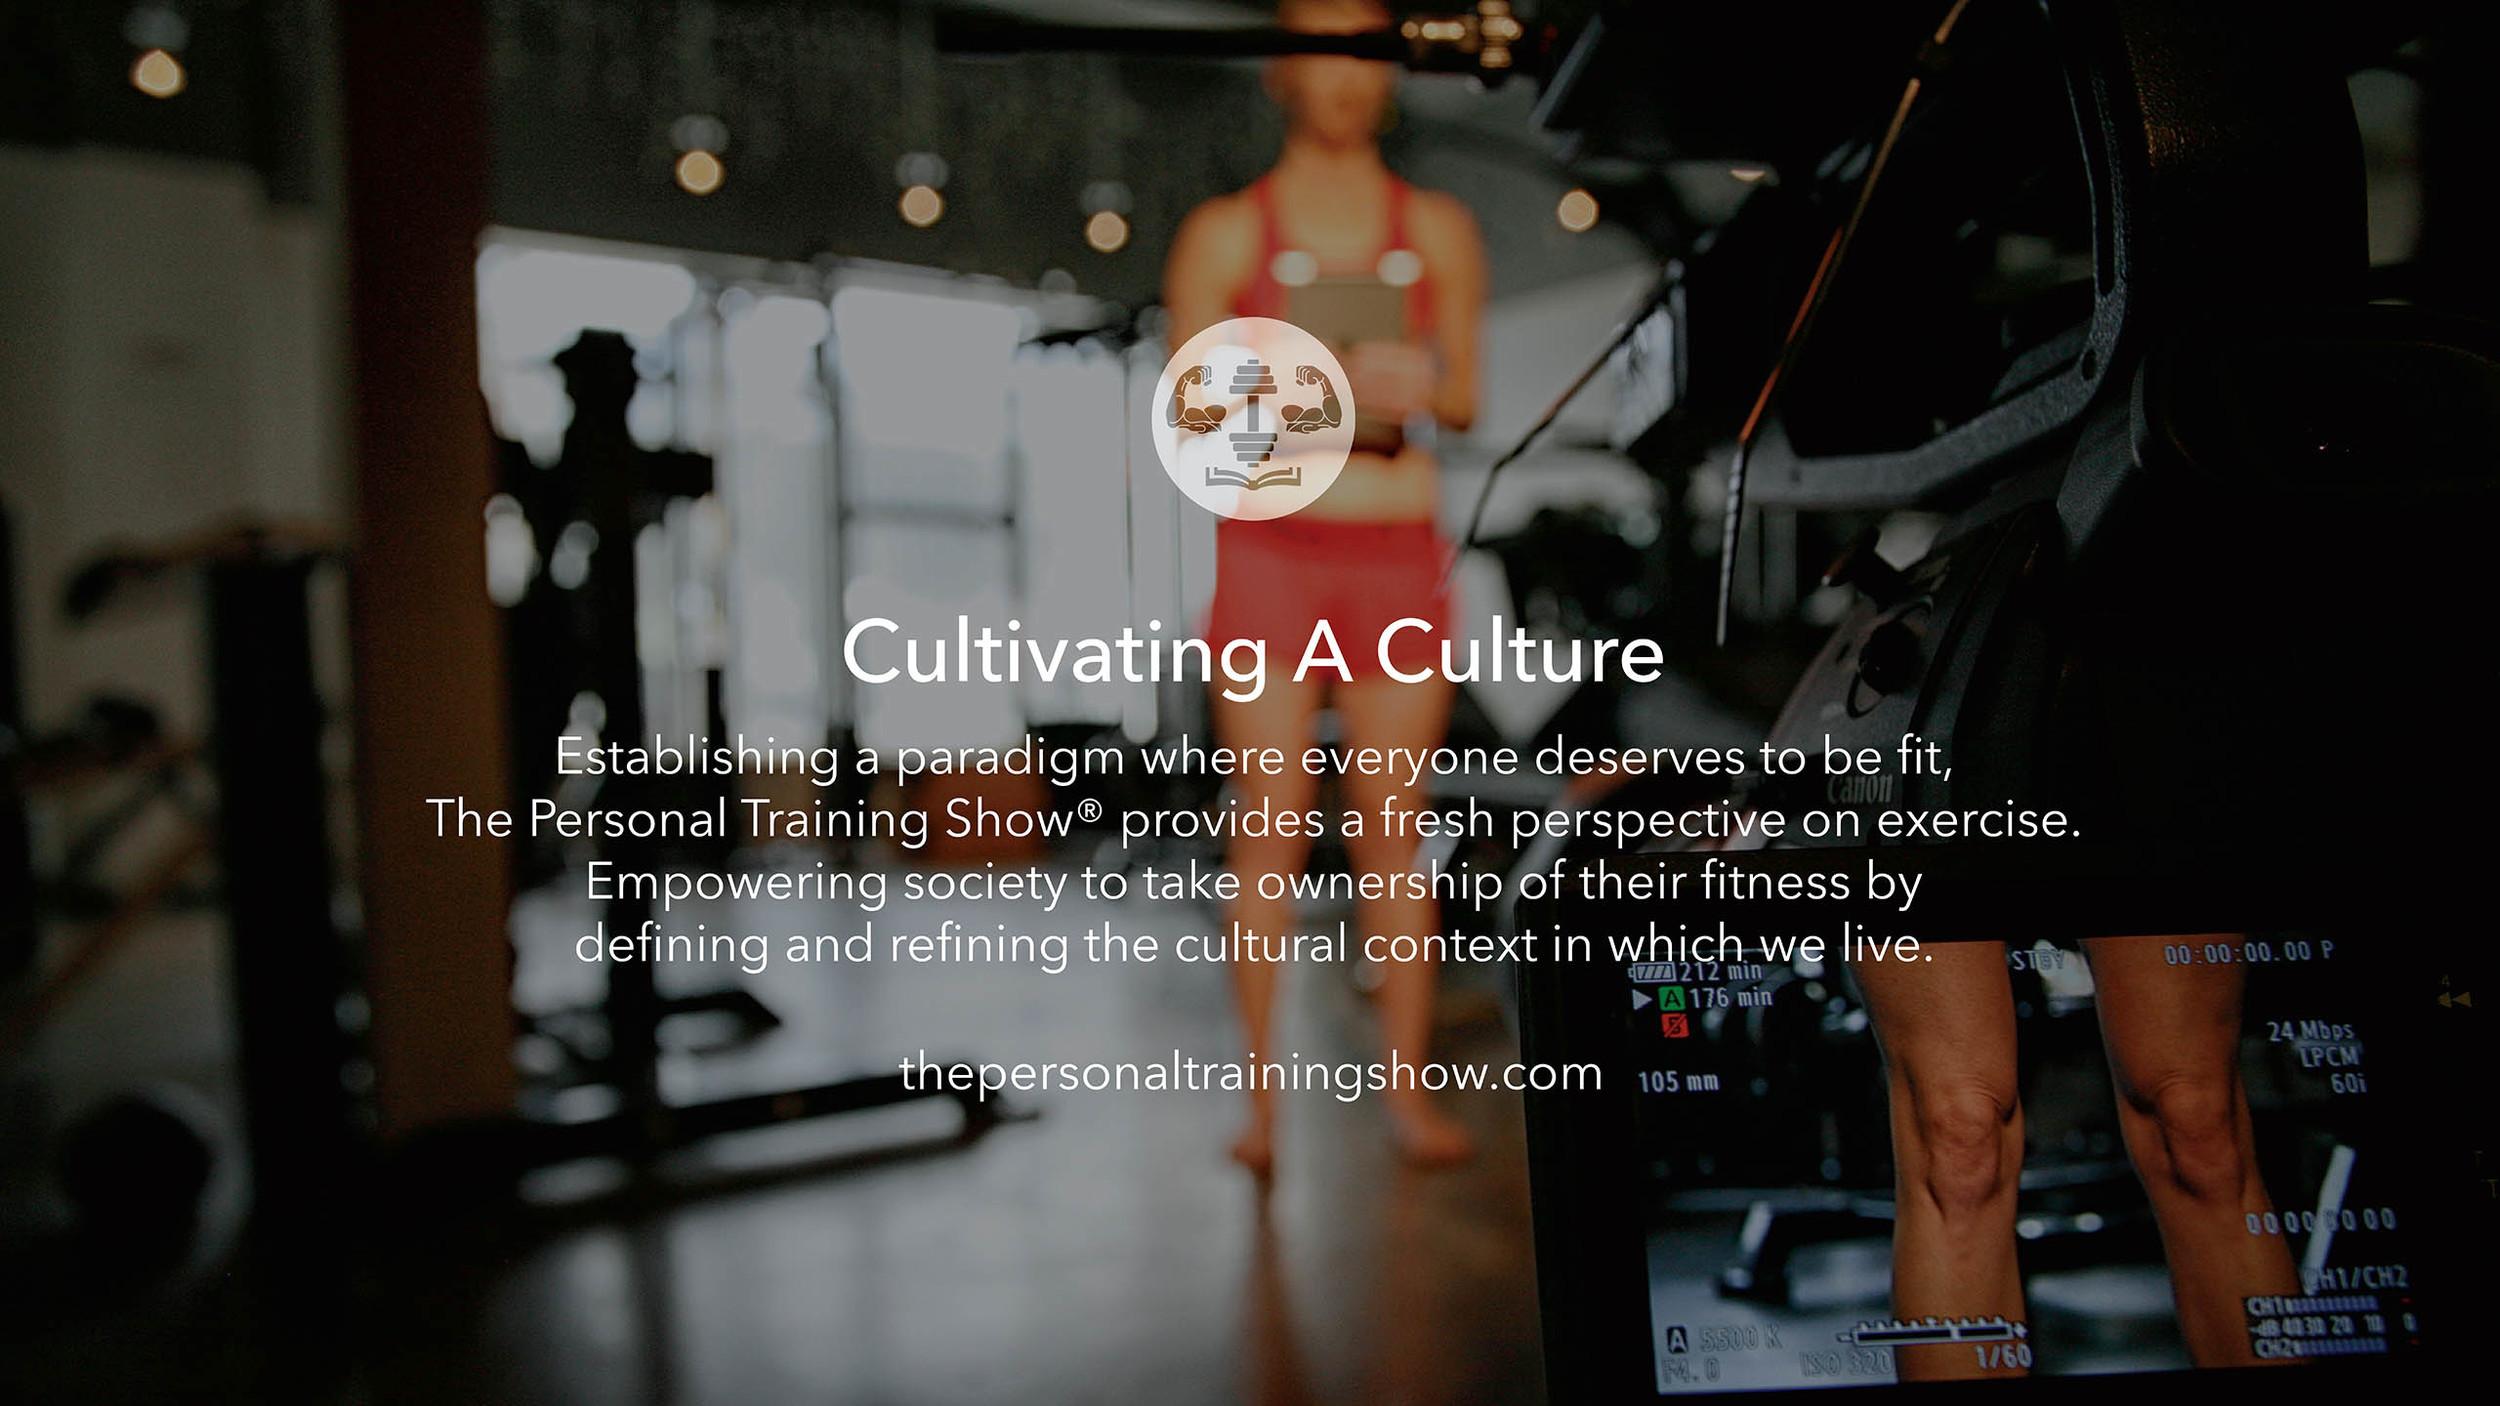 Cultivating A Culture